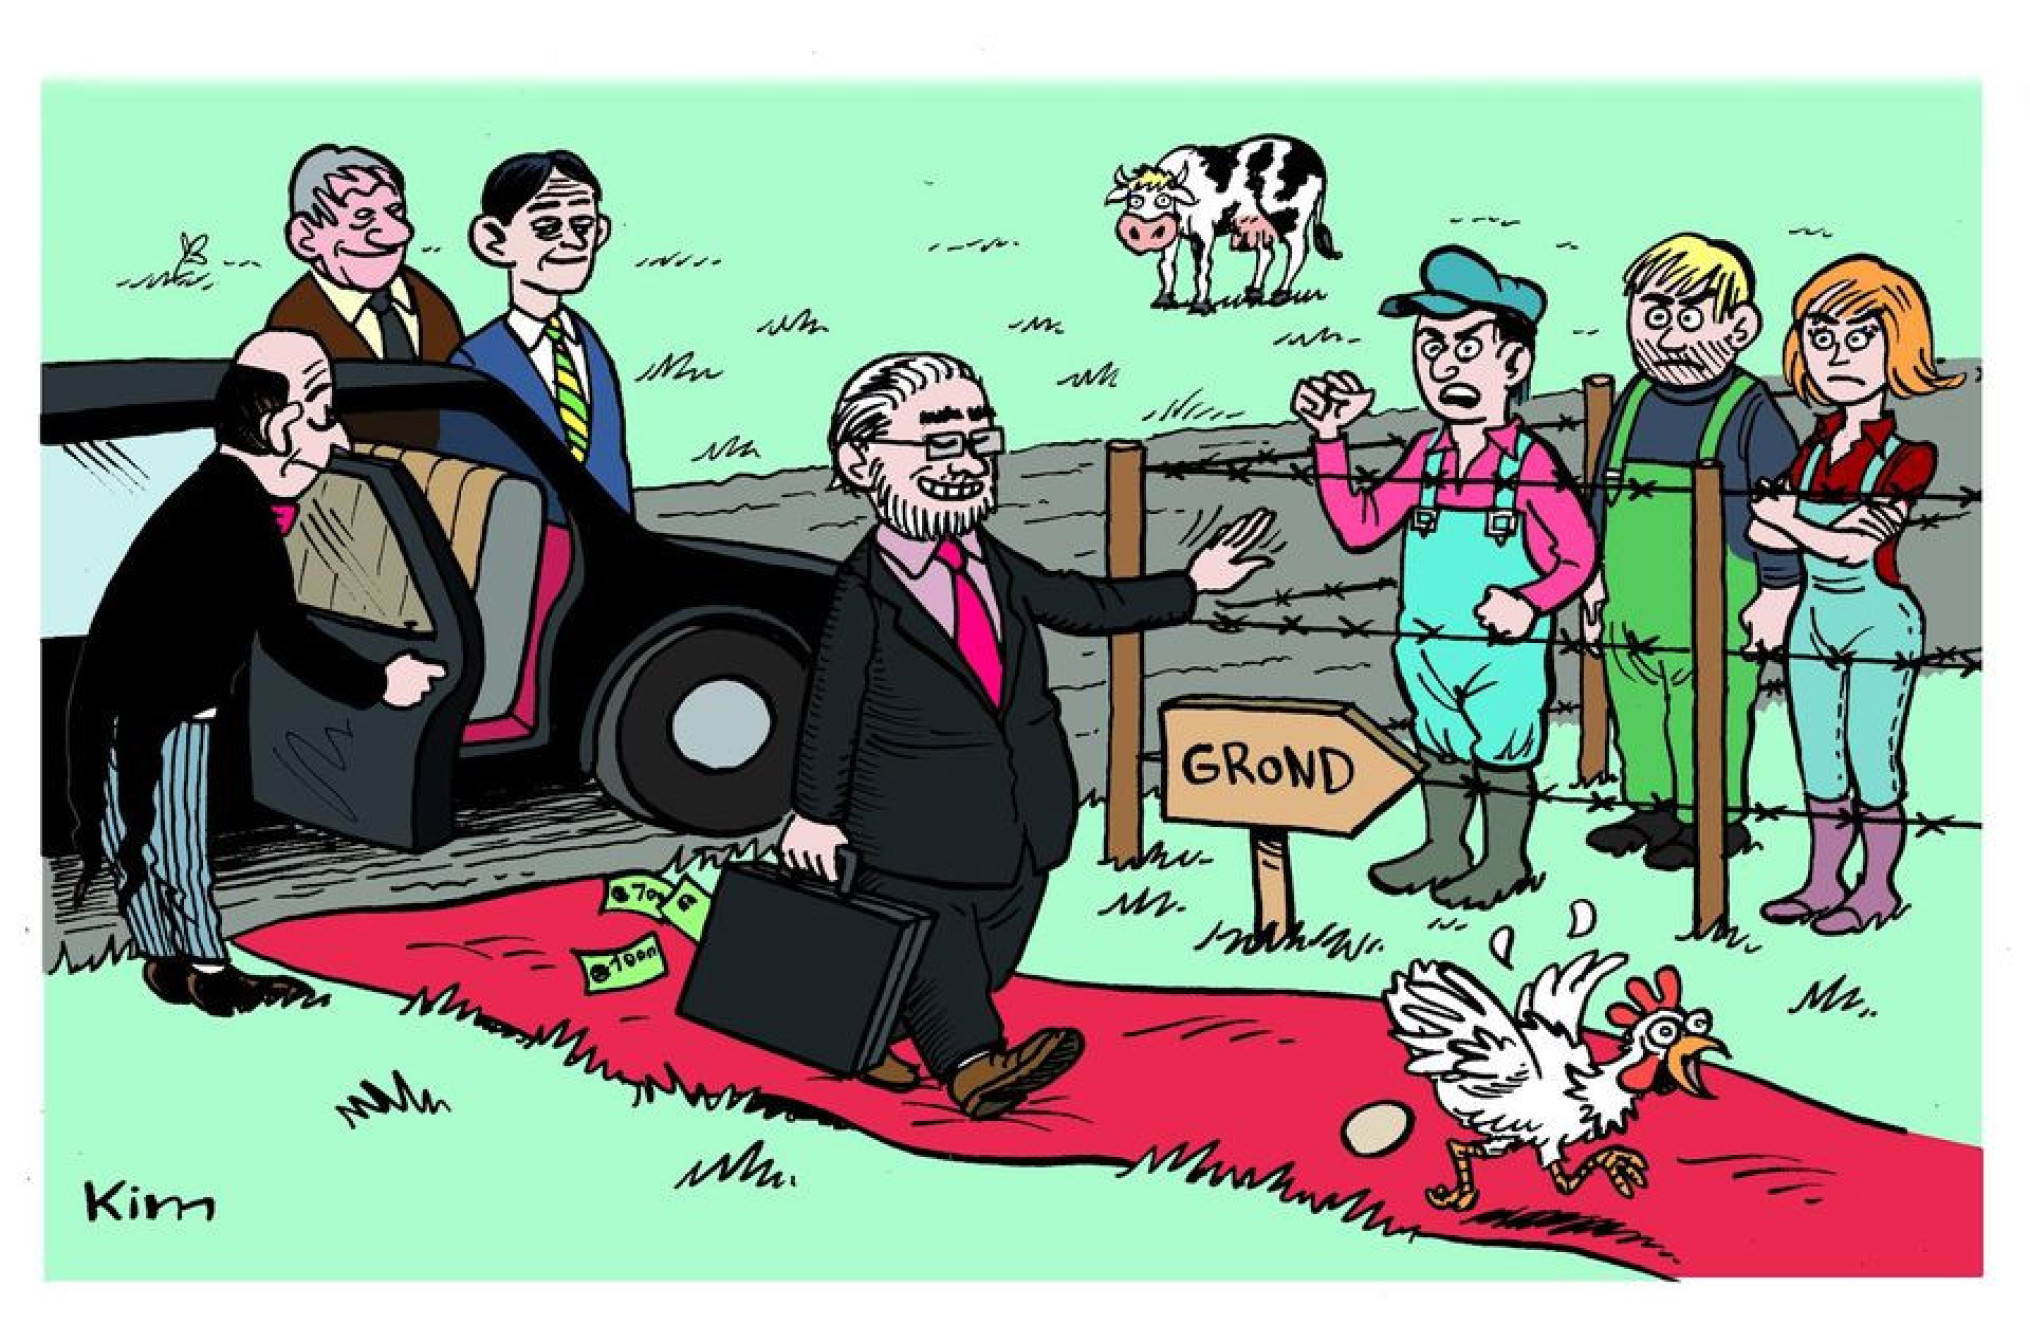 cartoon boerenforum boerenstrijddag